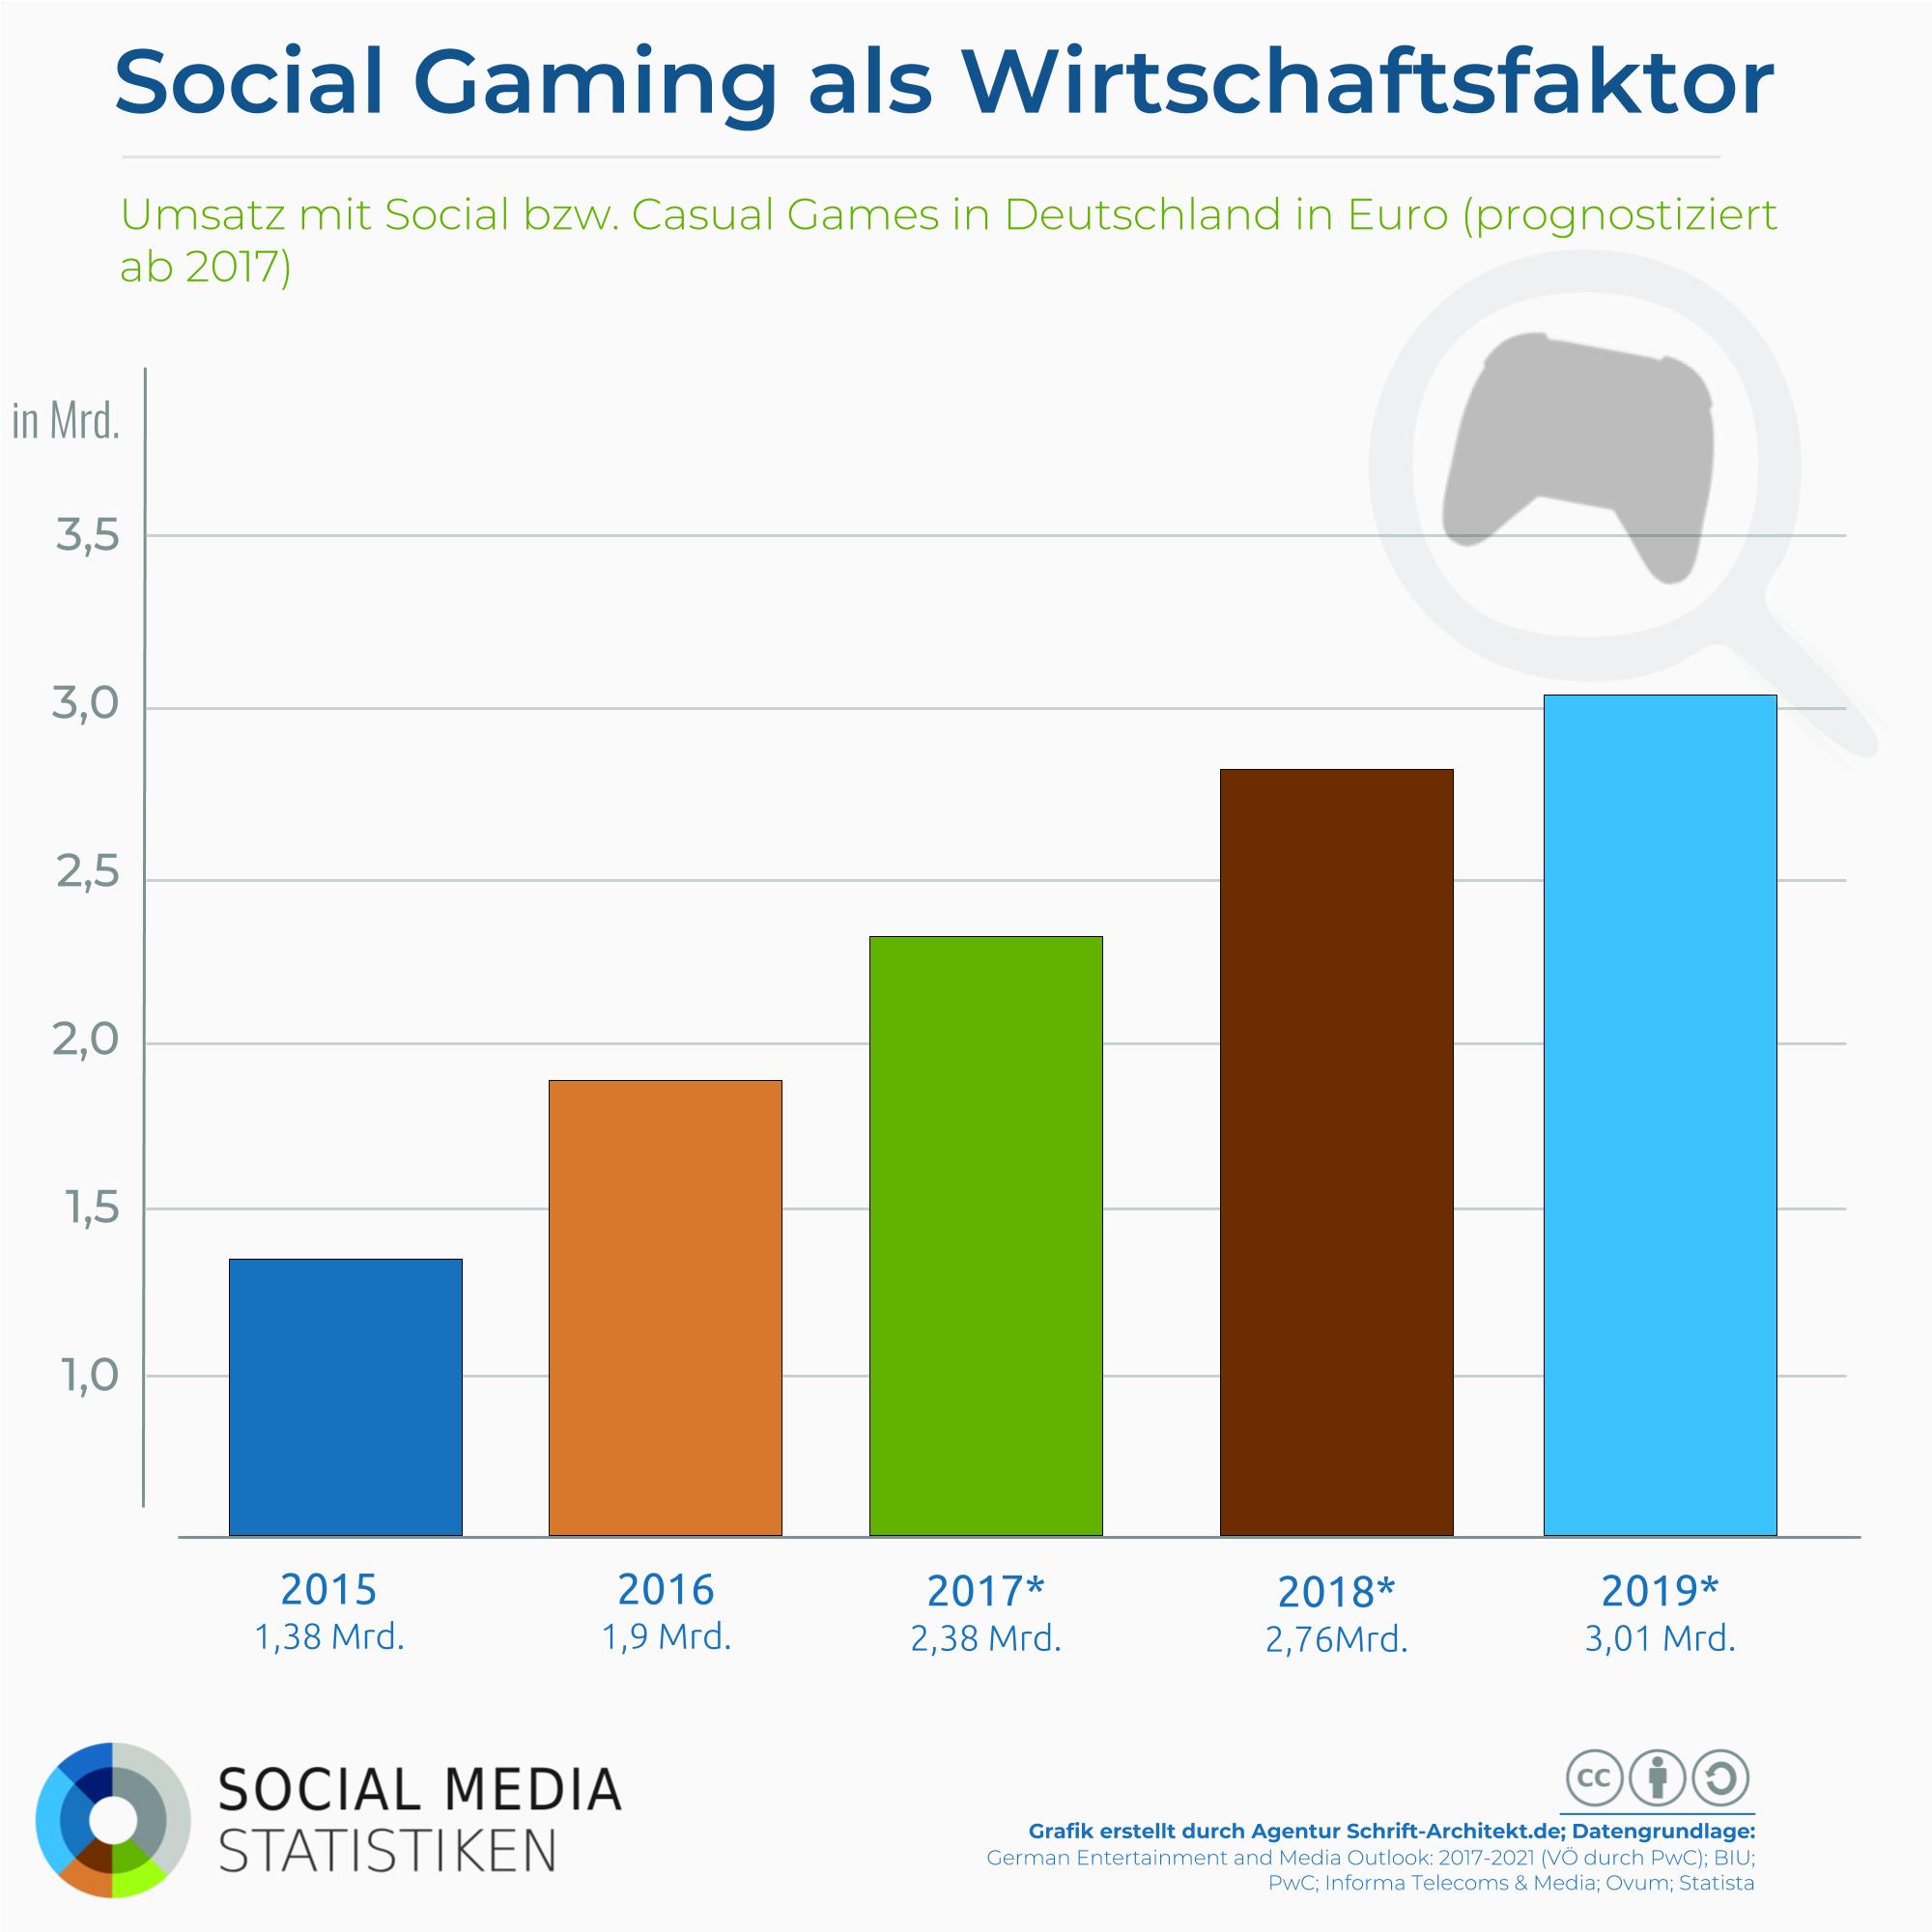 Candy Crush, FarmVille & Co.: Social Gaming immer größerer Wirtschaftsfaktor